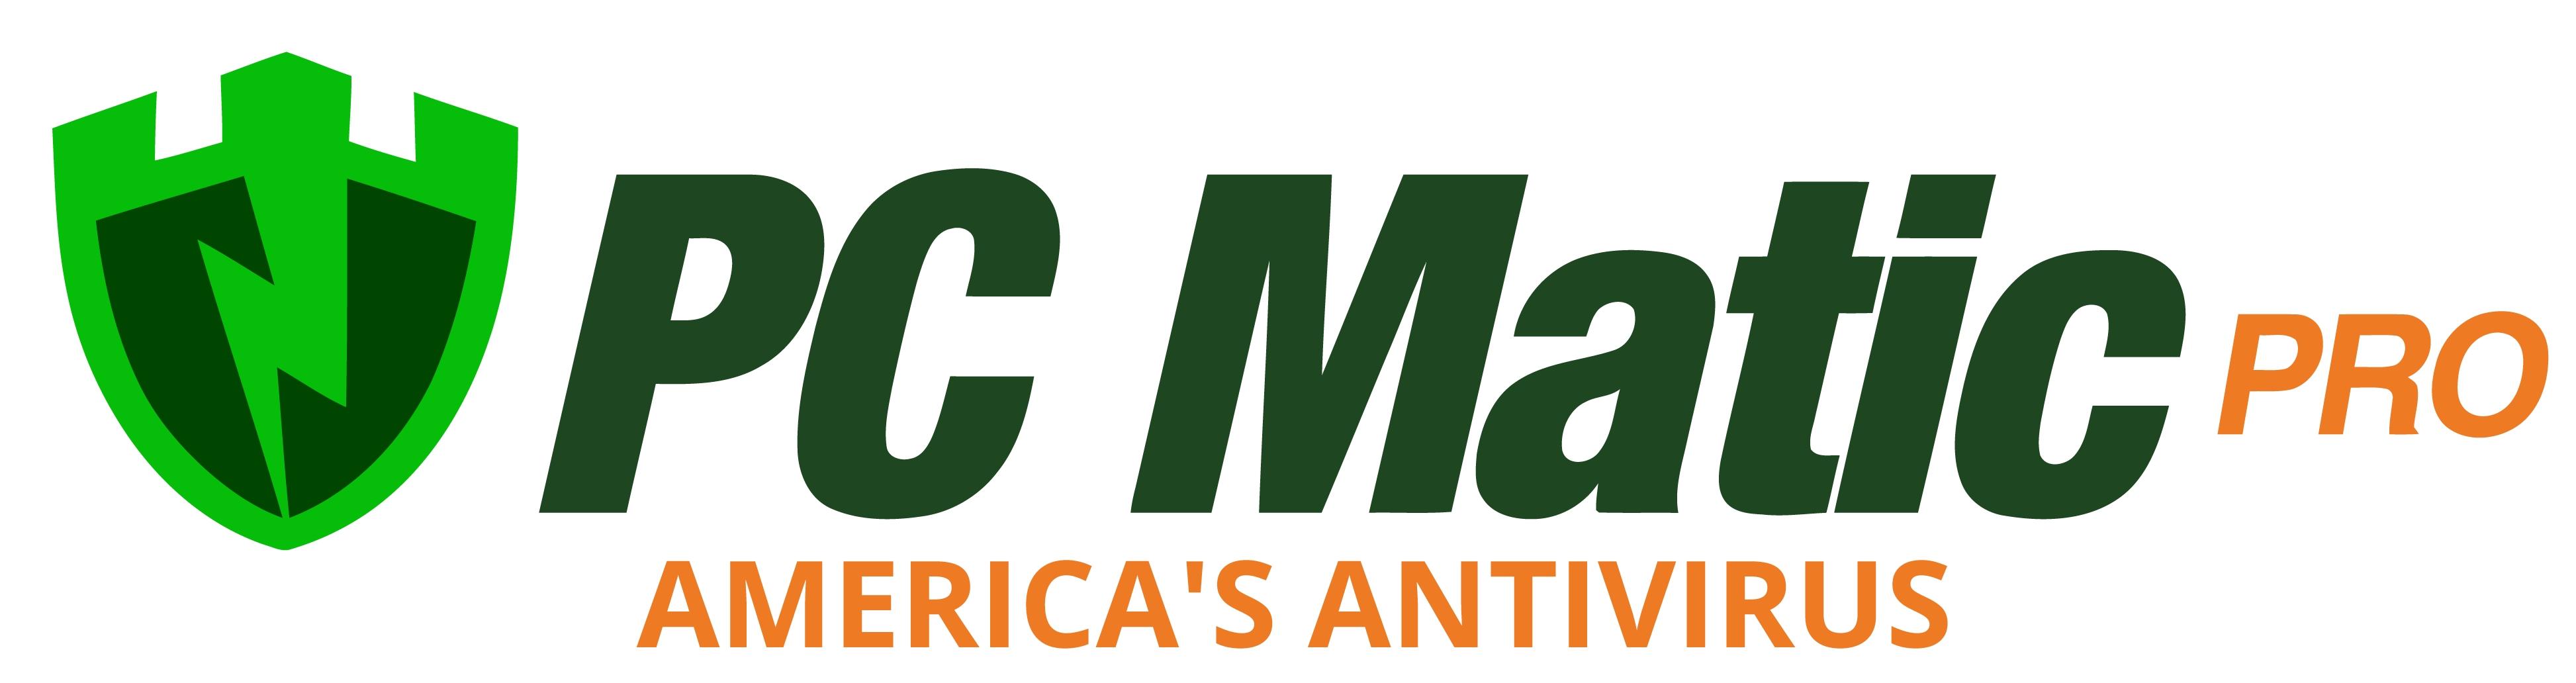 pcmaticPRO-tag-americas-antivirus-GRN